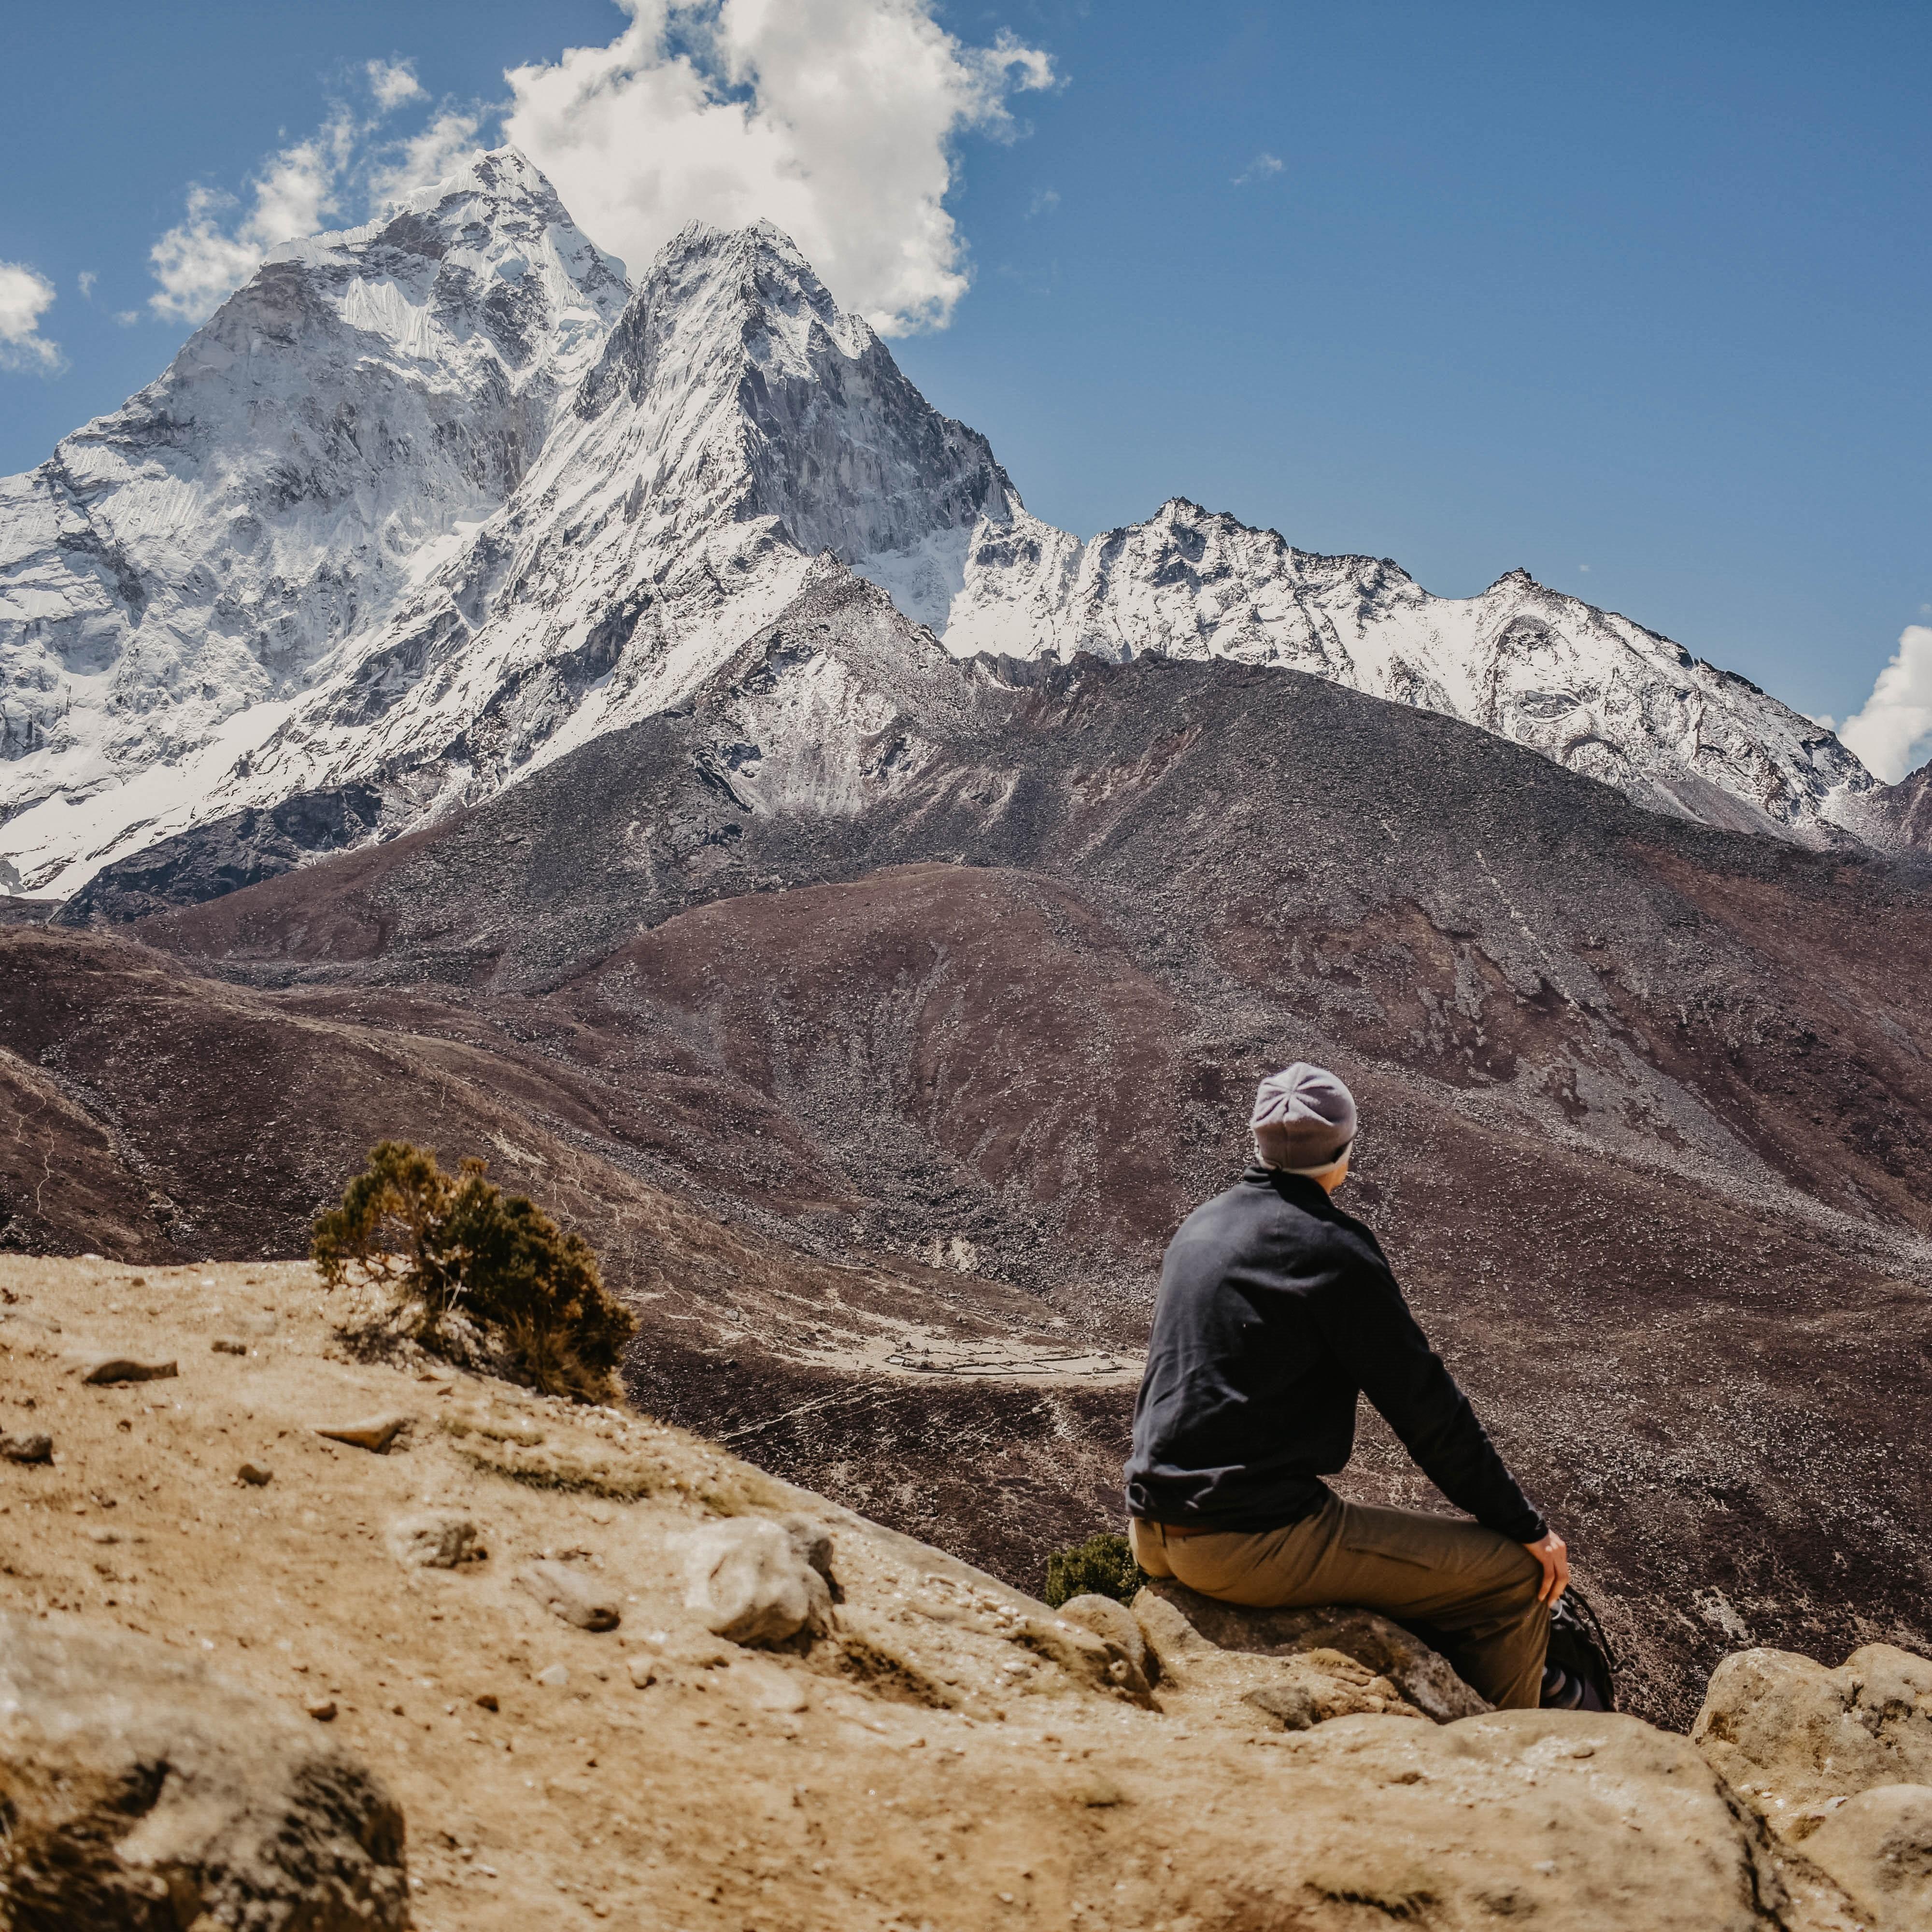 Climbing up above Dingboche on the Everest Base Camp Trek